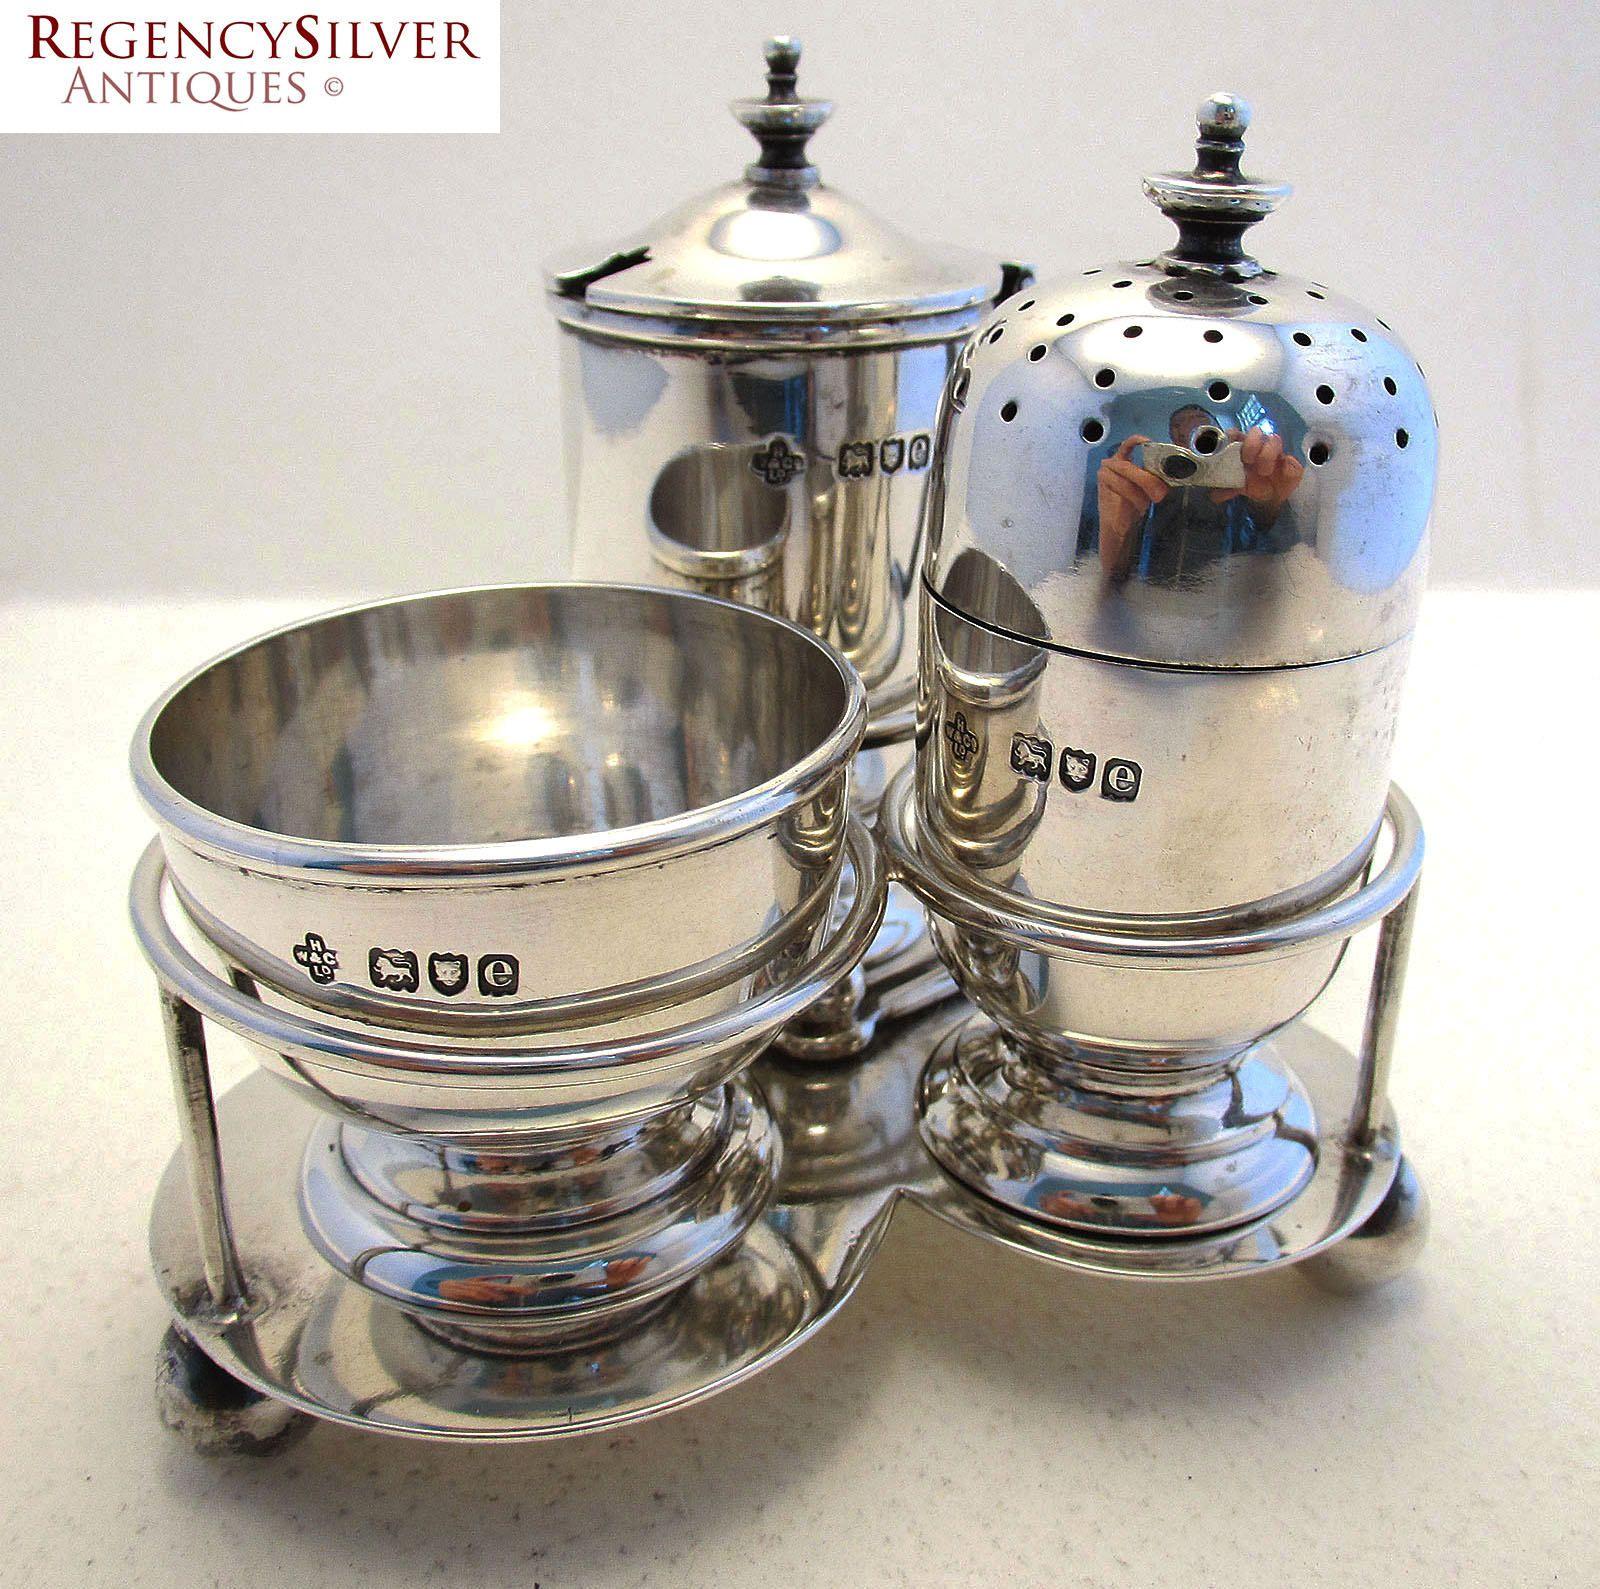 Kitchen Decor 1930s Unique Serving Spice Pot Gift For Home,#0219JWc Vintage Pepper Pot Silver Plated Made England Antique Pepper Pot